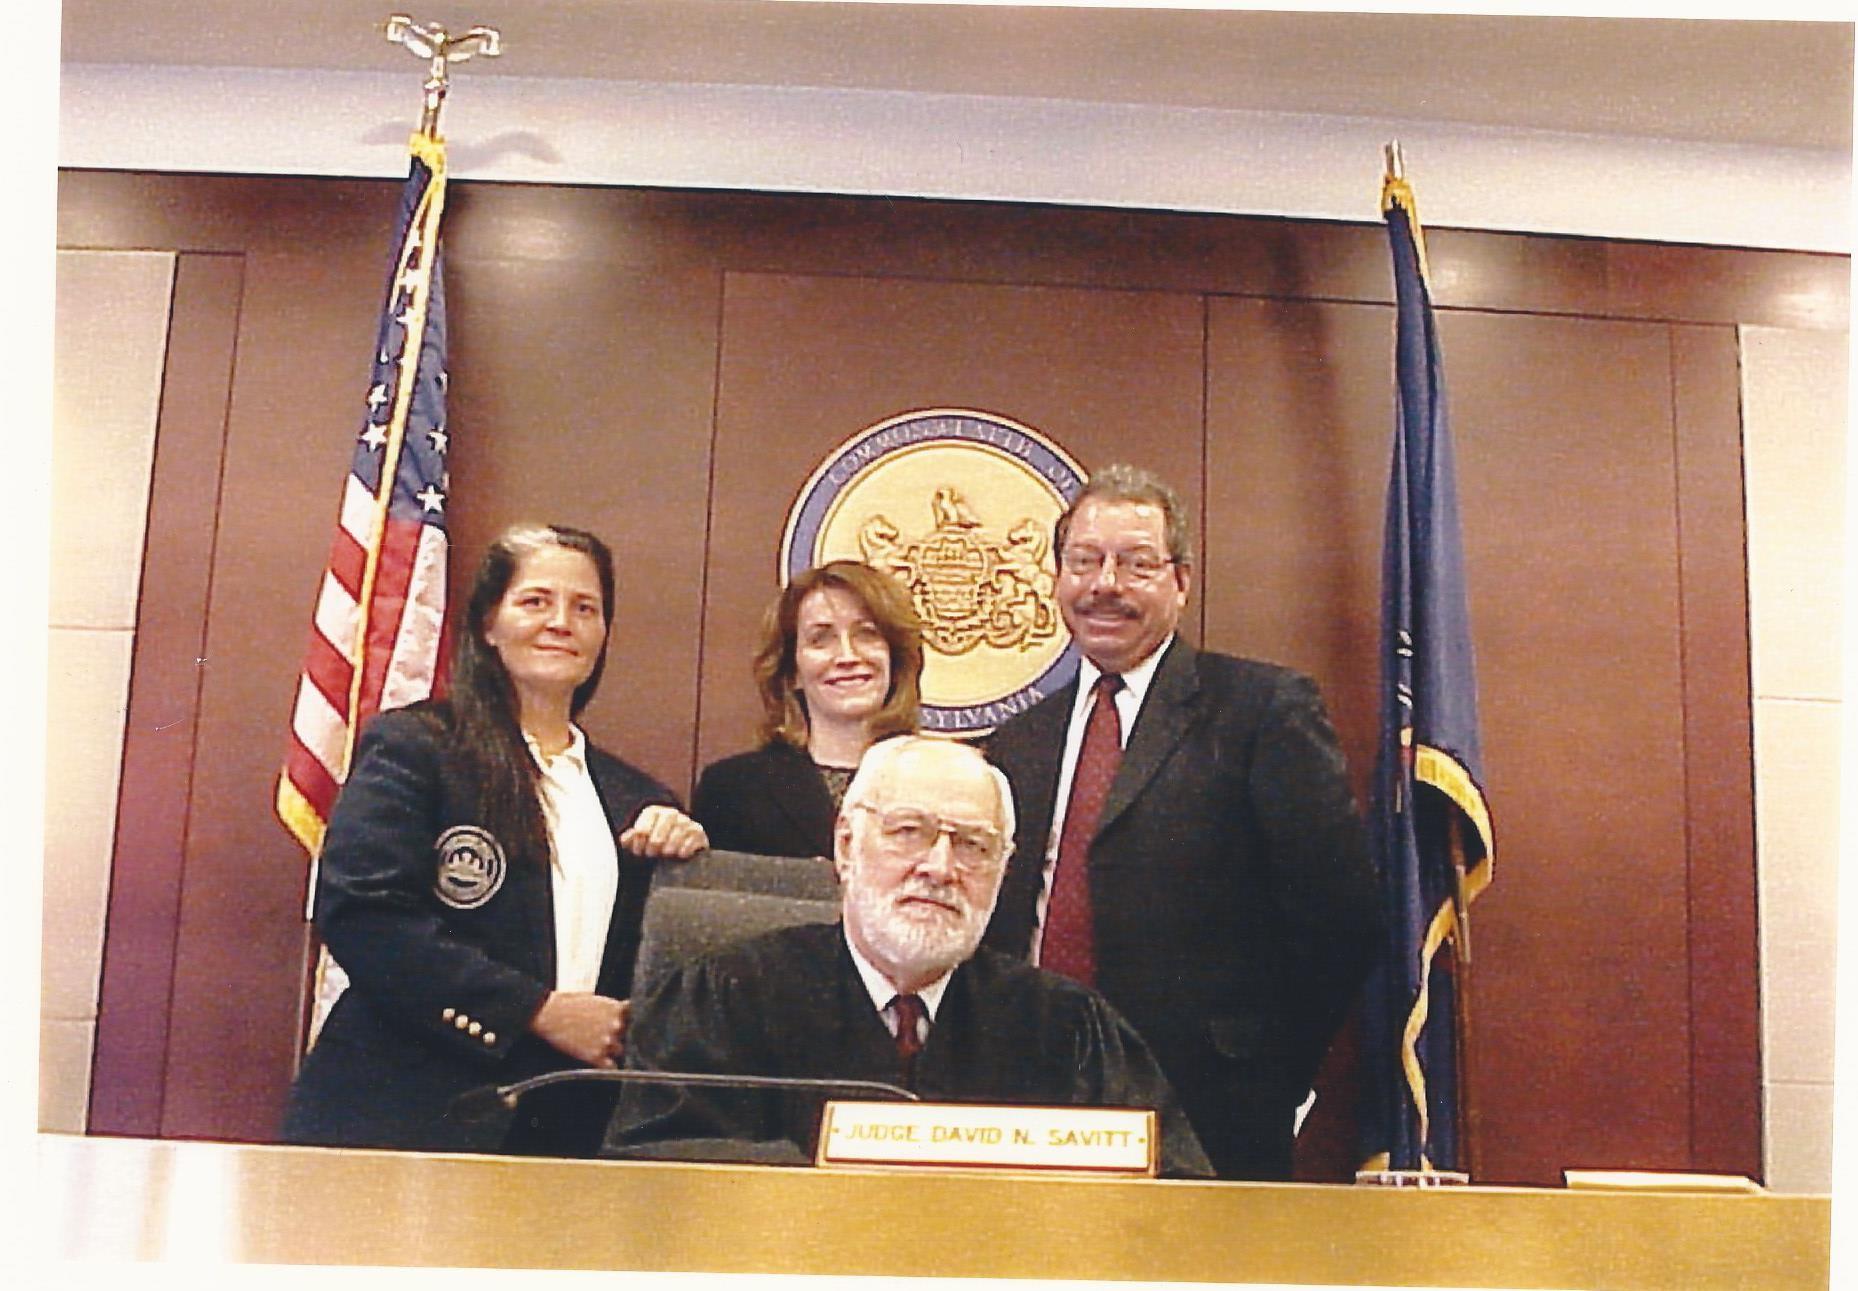 Judge David N. Savitt with Common Pleas Court staff.